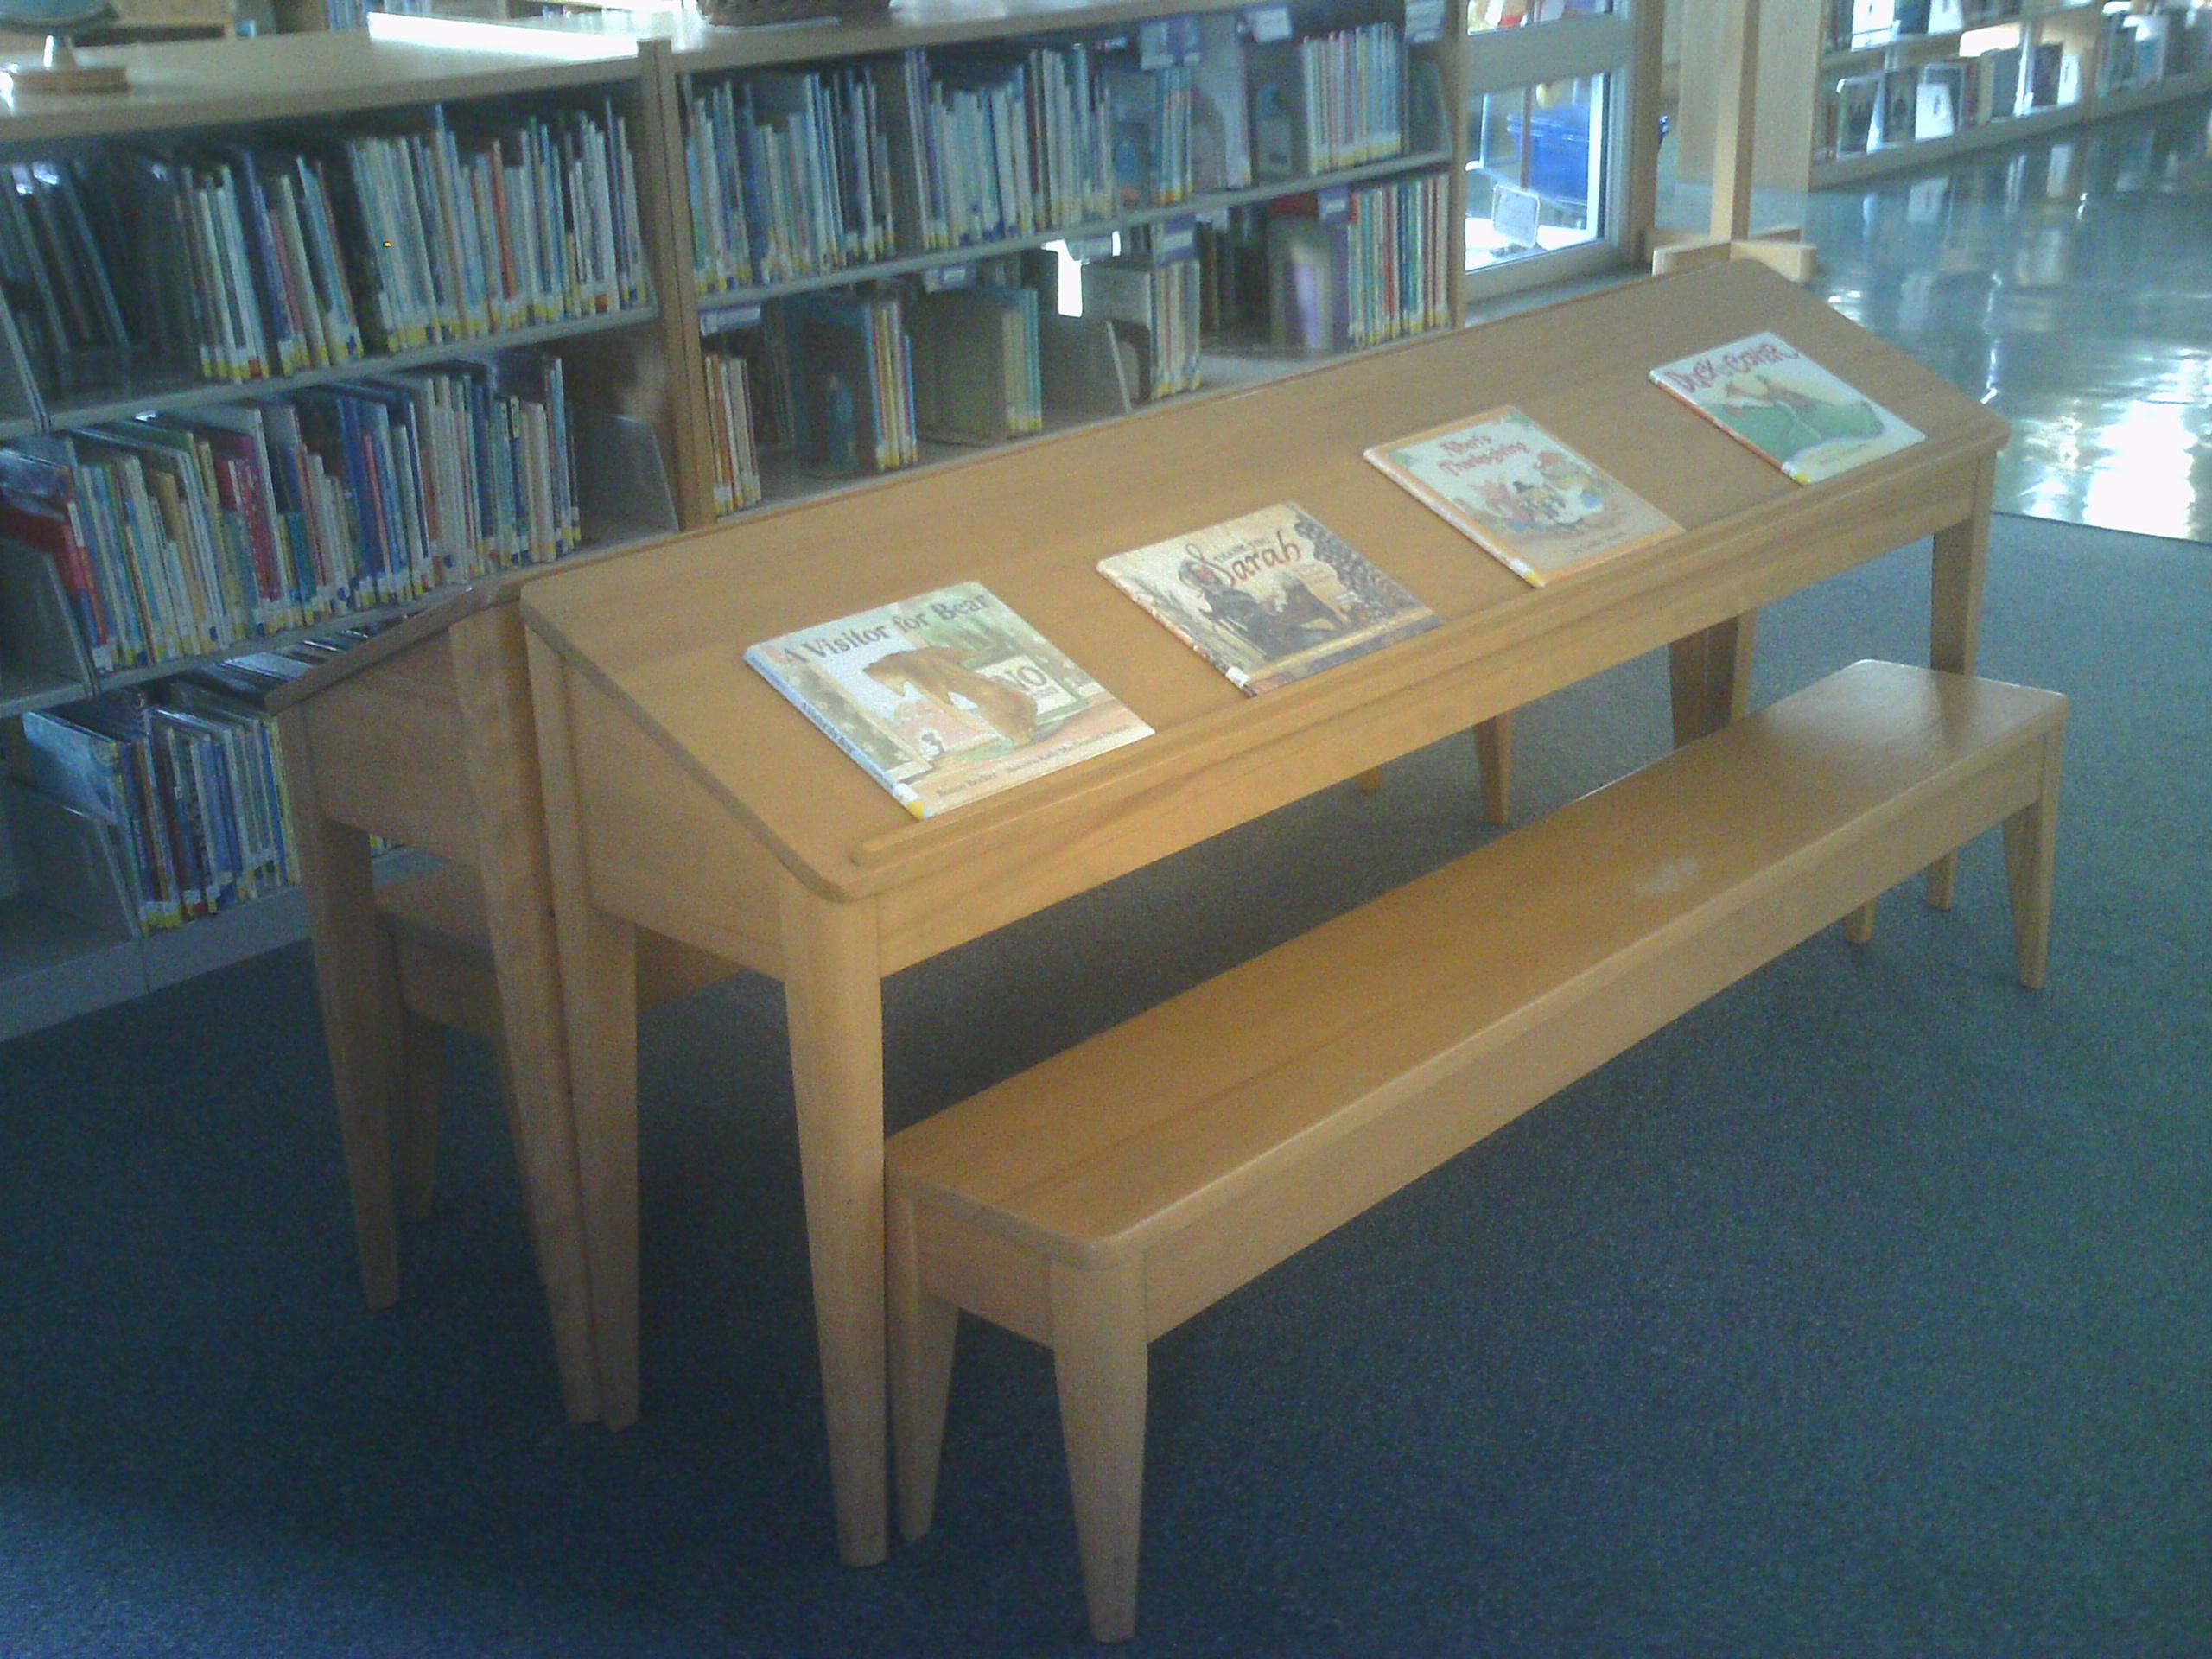 technologytrainingwheels pbworks Library Furniture